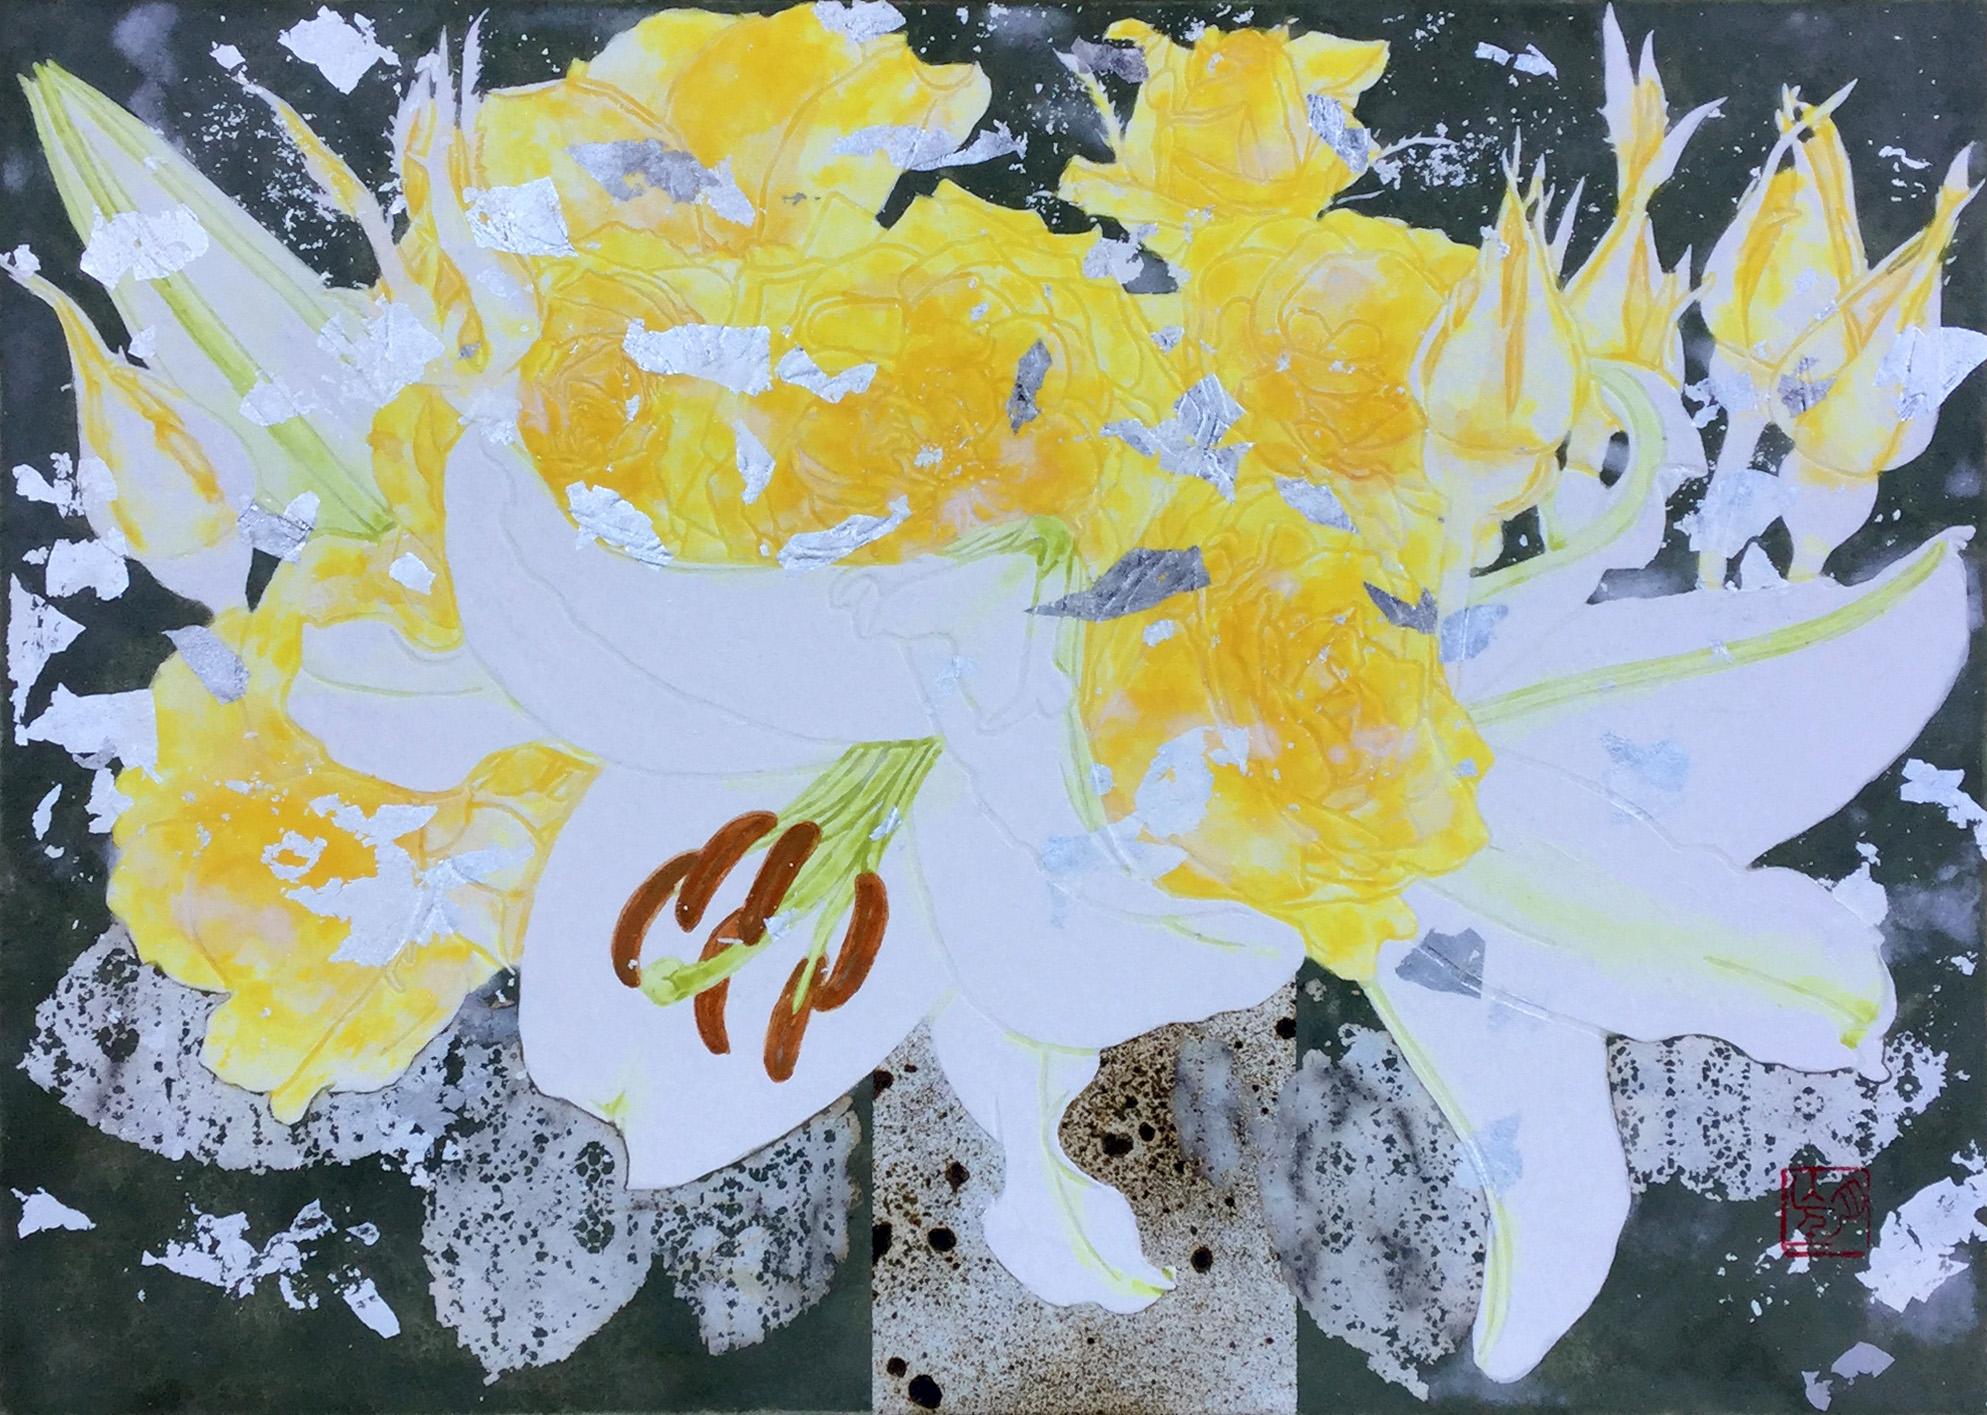 F4 白百合と黄色い薔薇